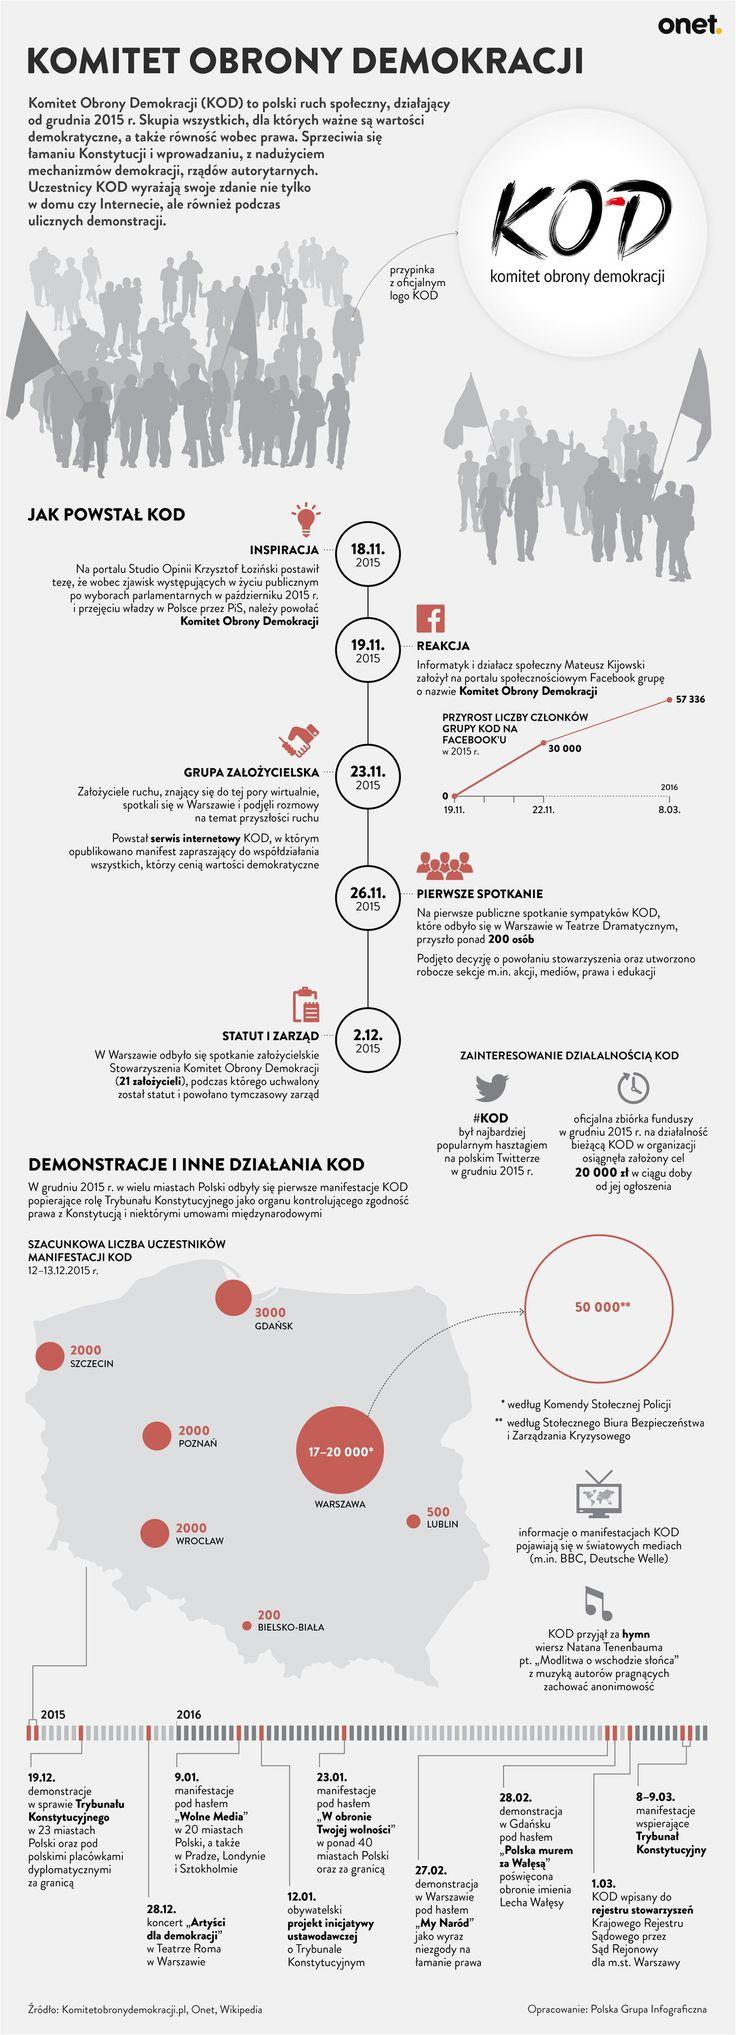 KOD infografika Onet